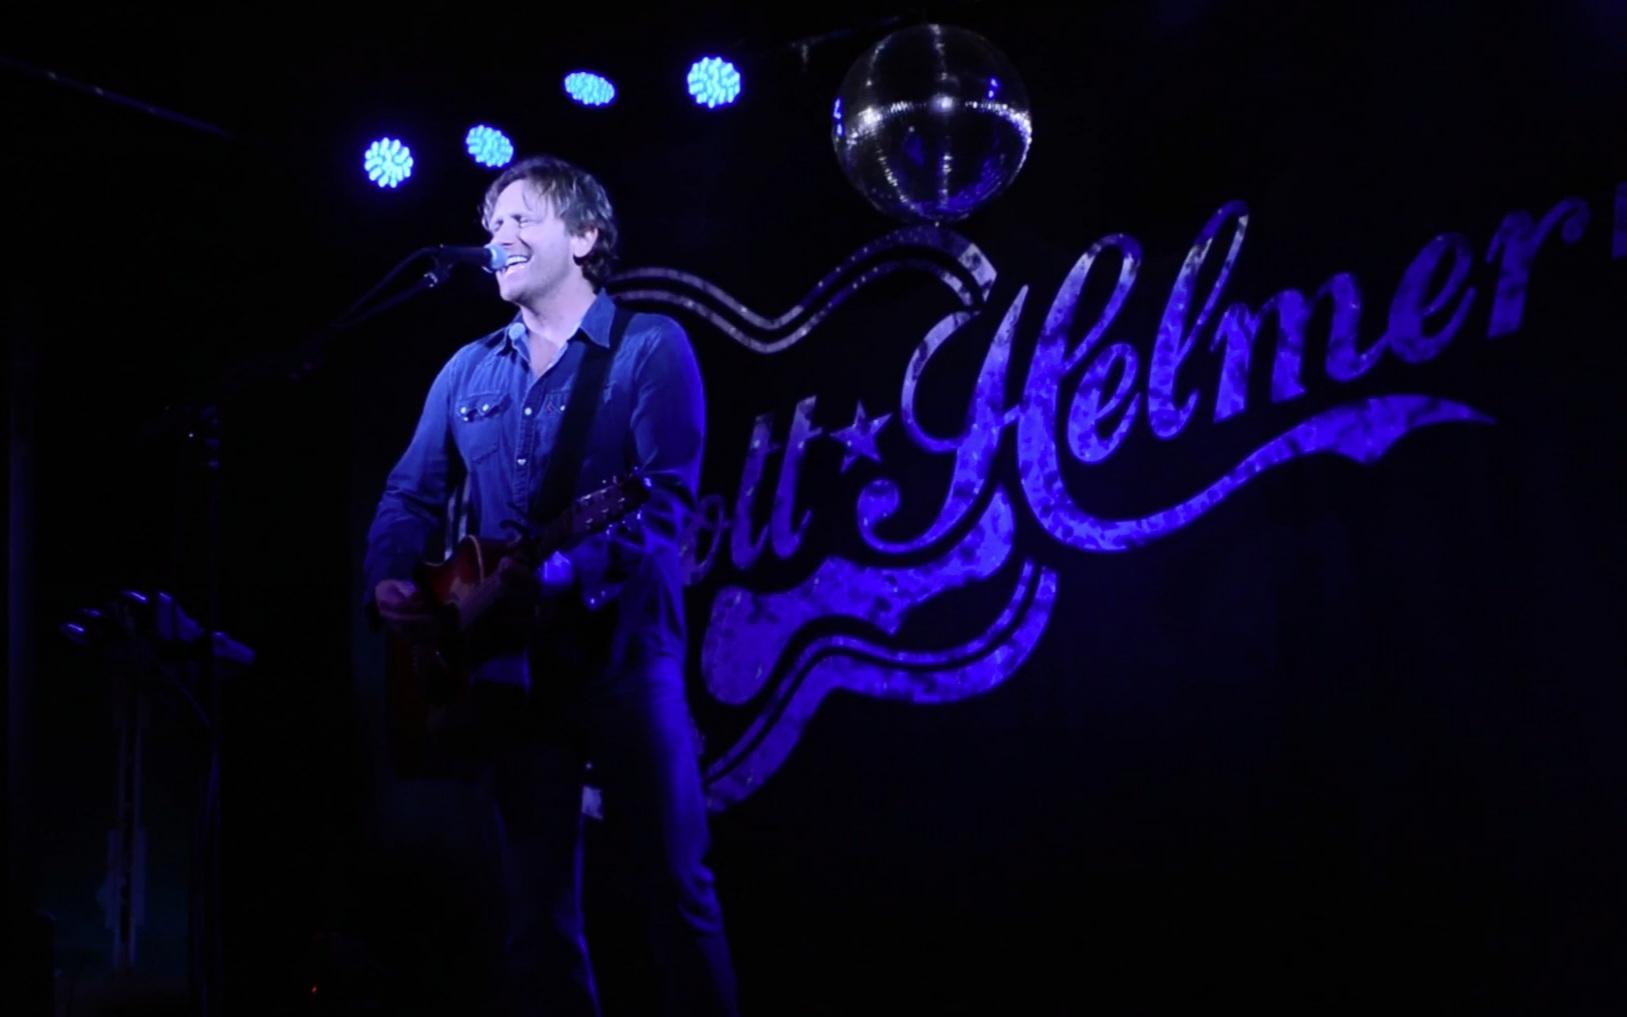 Scott+Helmer+Live+On+Stage